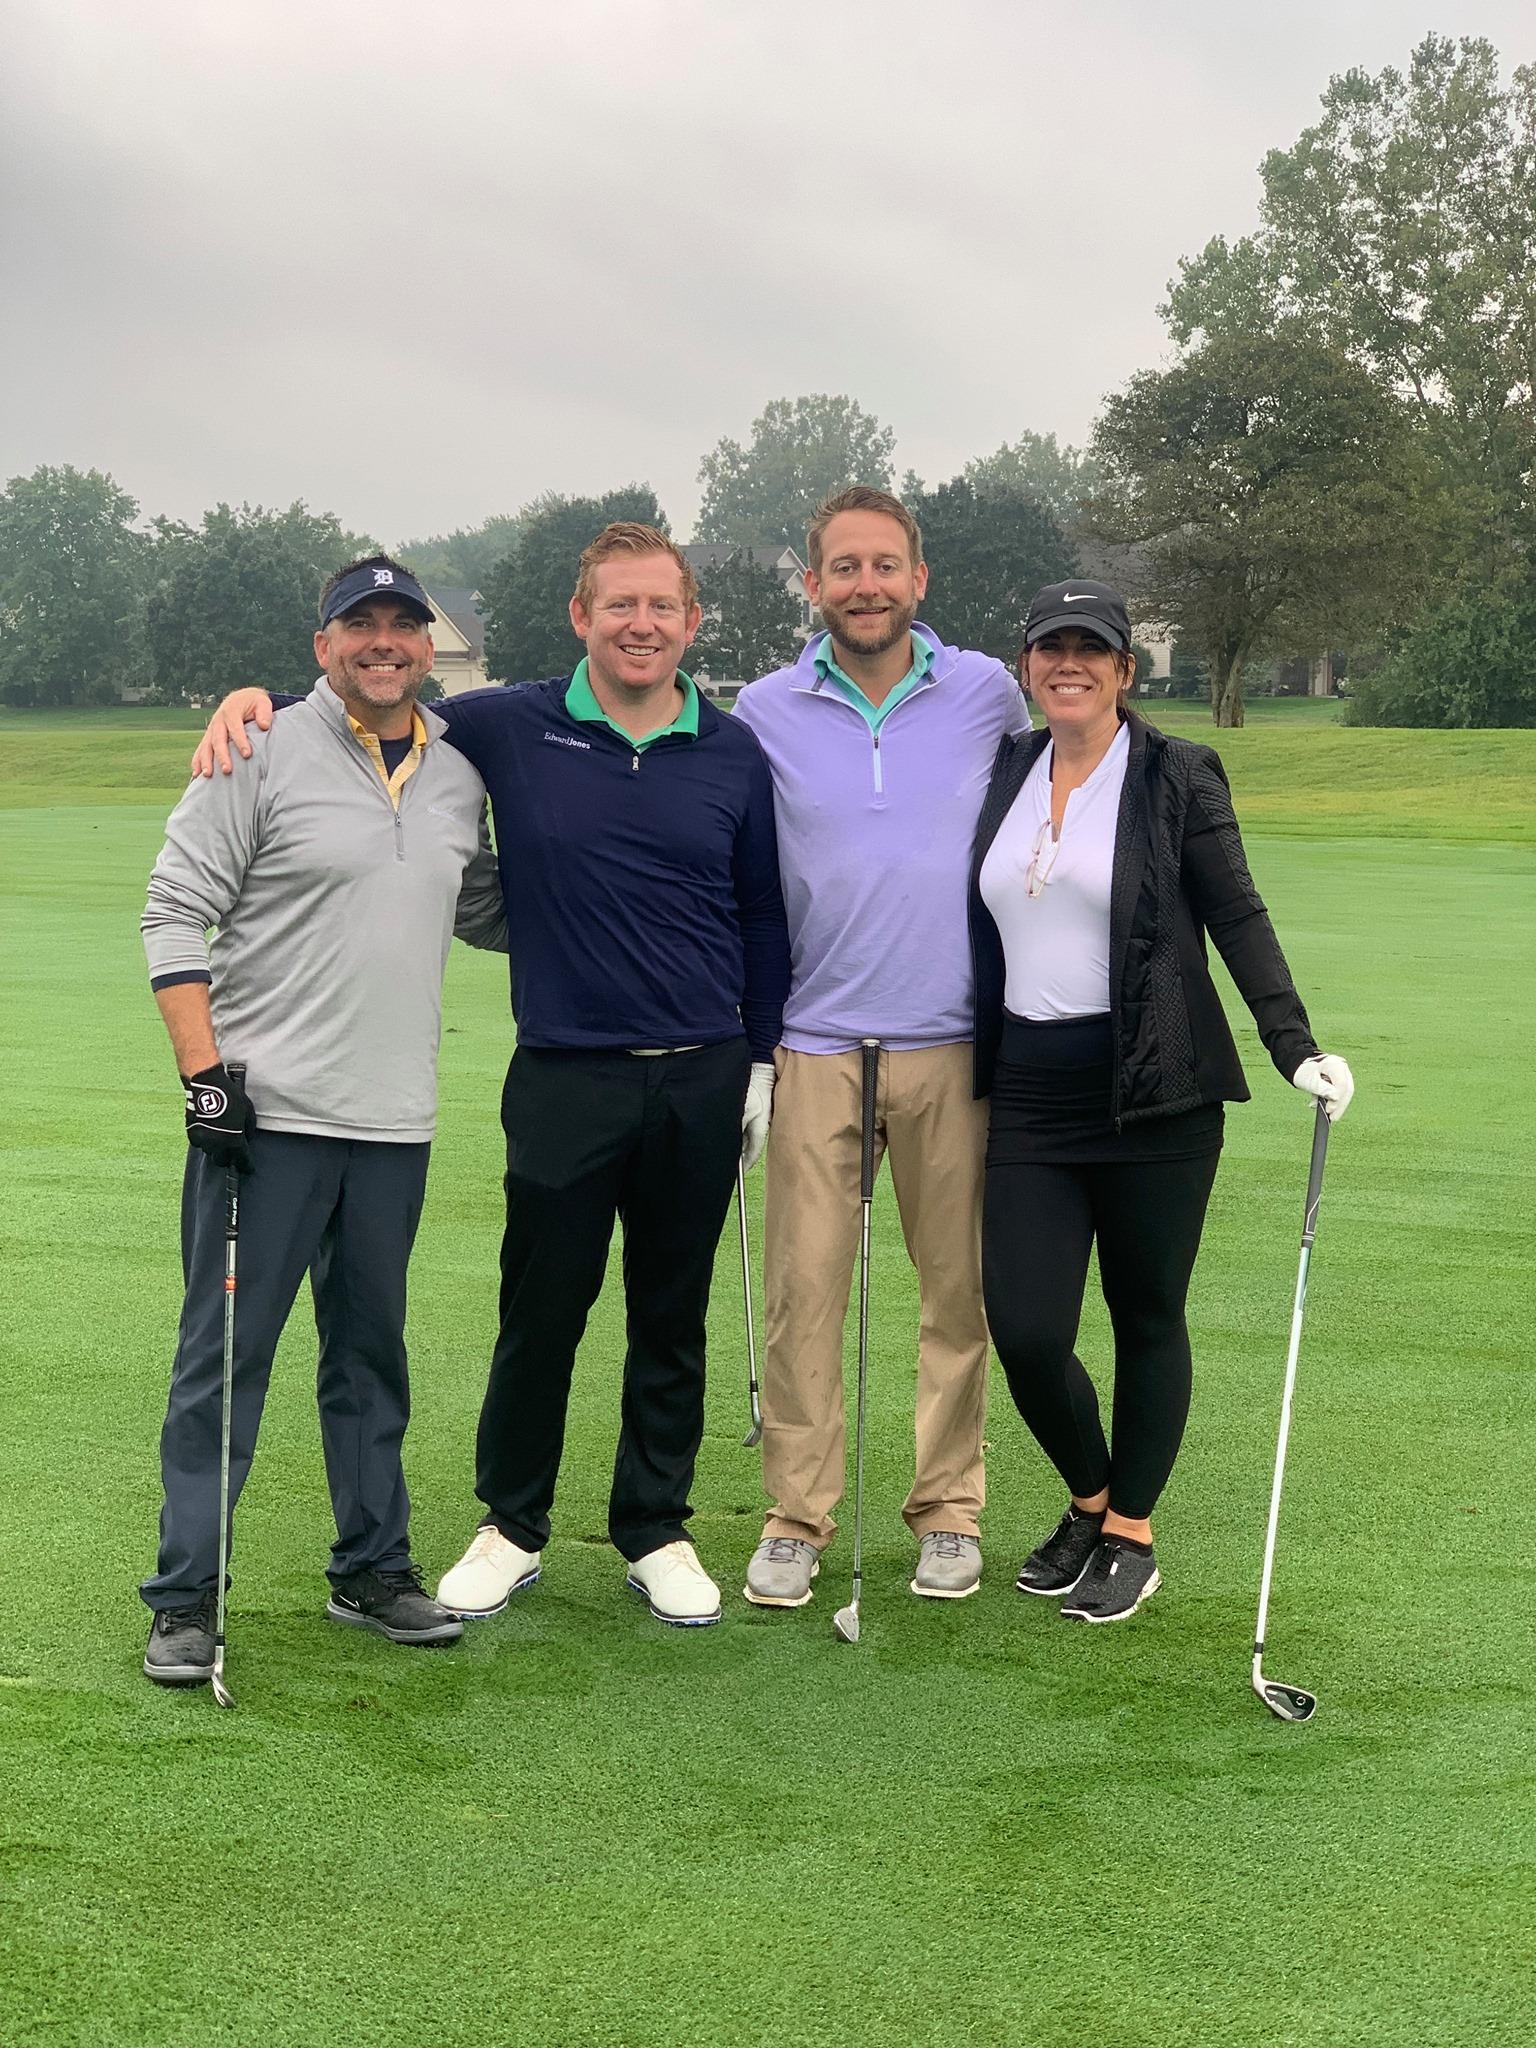 SACC-Golf-Outing-2021-Edward-Jones-Group.jpg